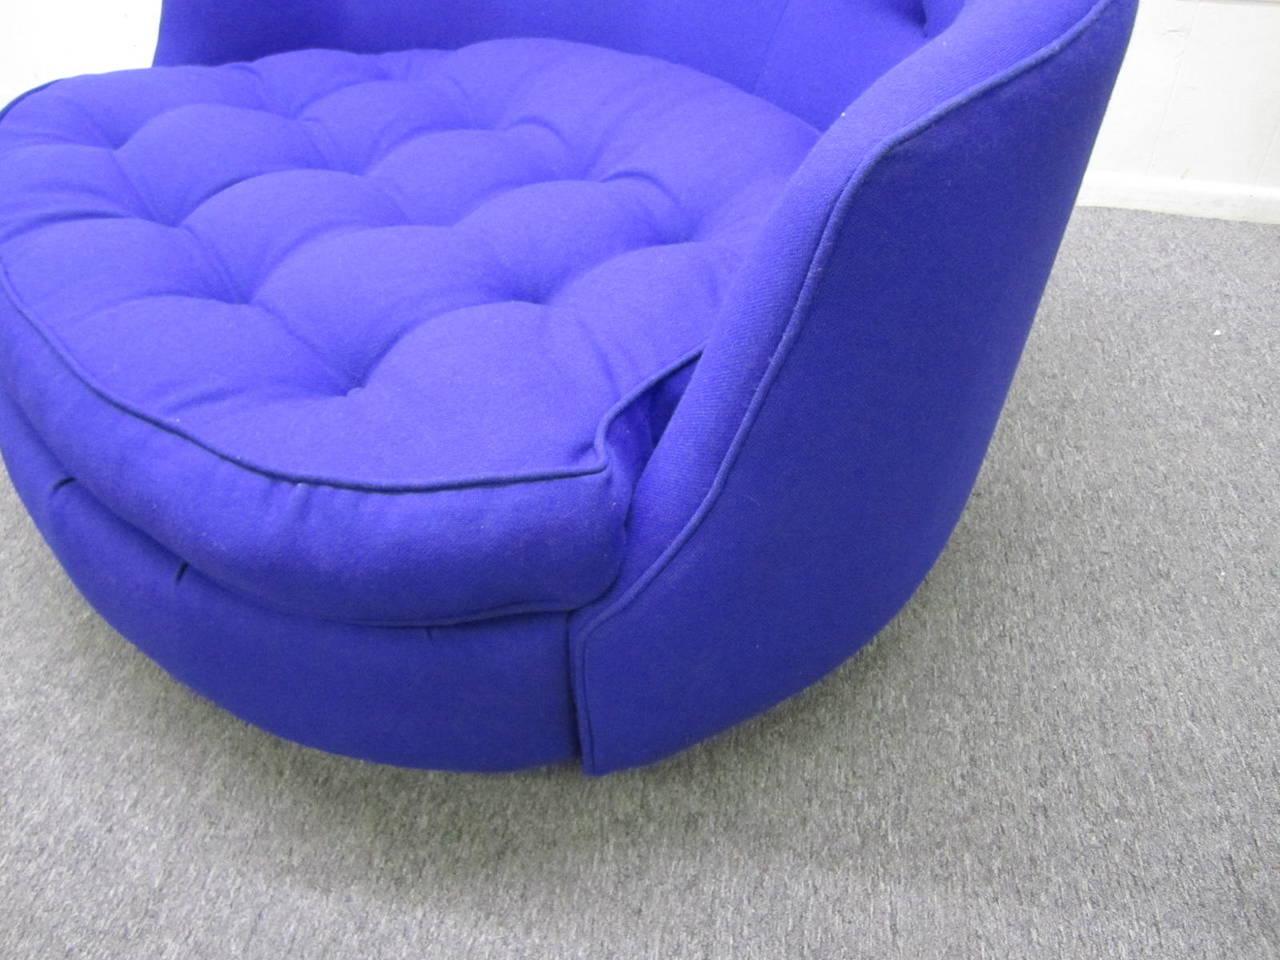 Fabulous Oversized Round Circular Milo Baughman Swivel Lounge Chair at 1stdibs